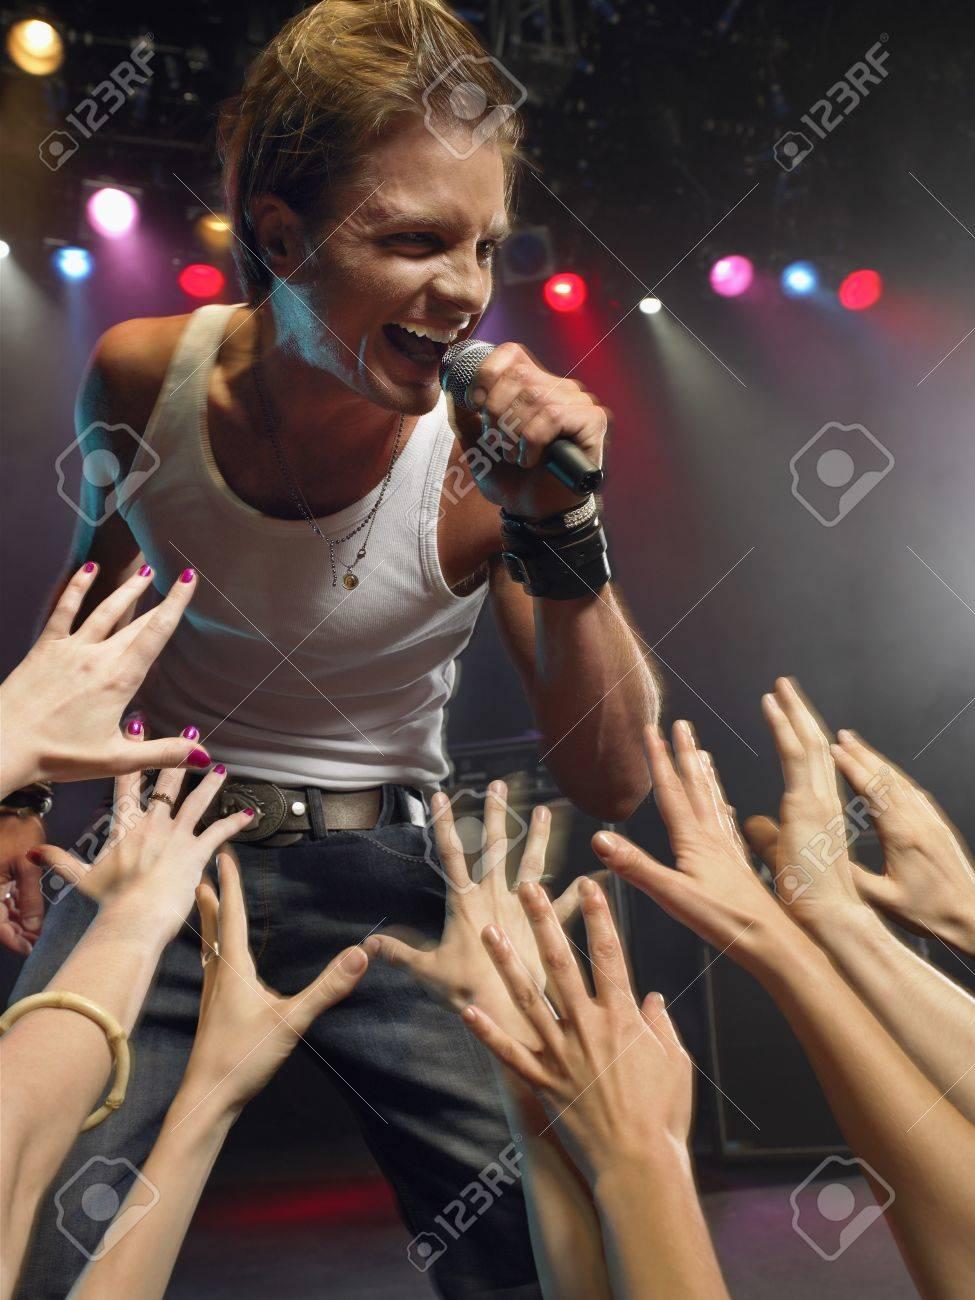 Young Man Singing at Concert Stock Photo - 18886276